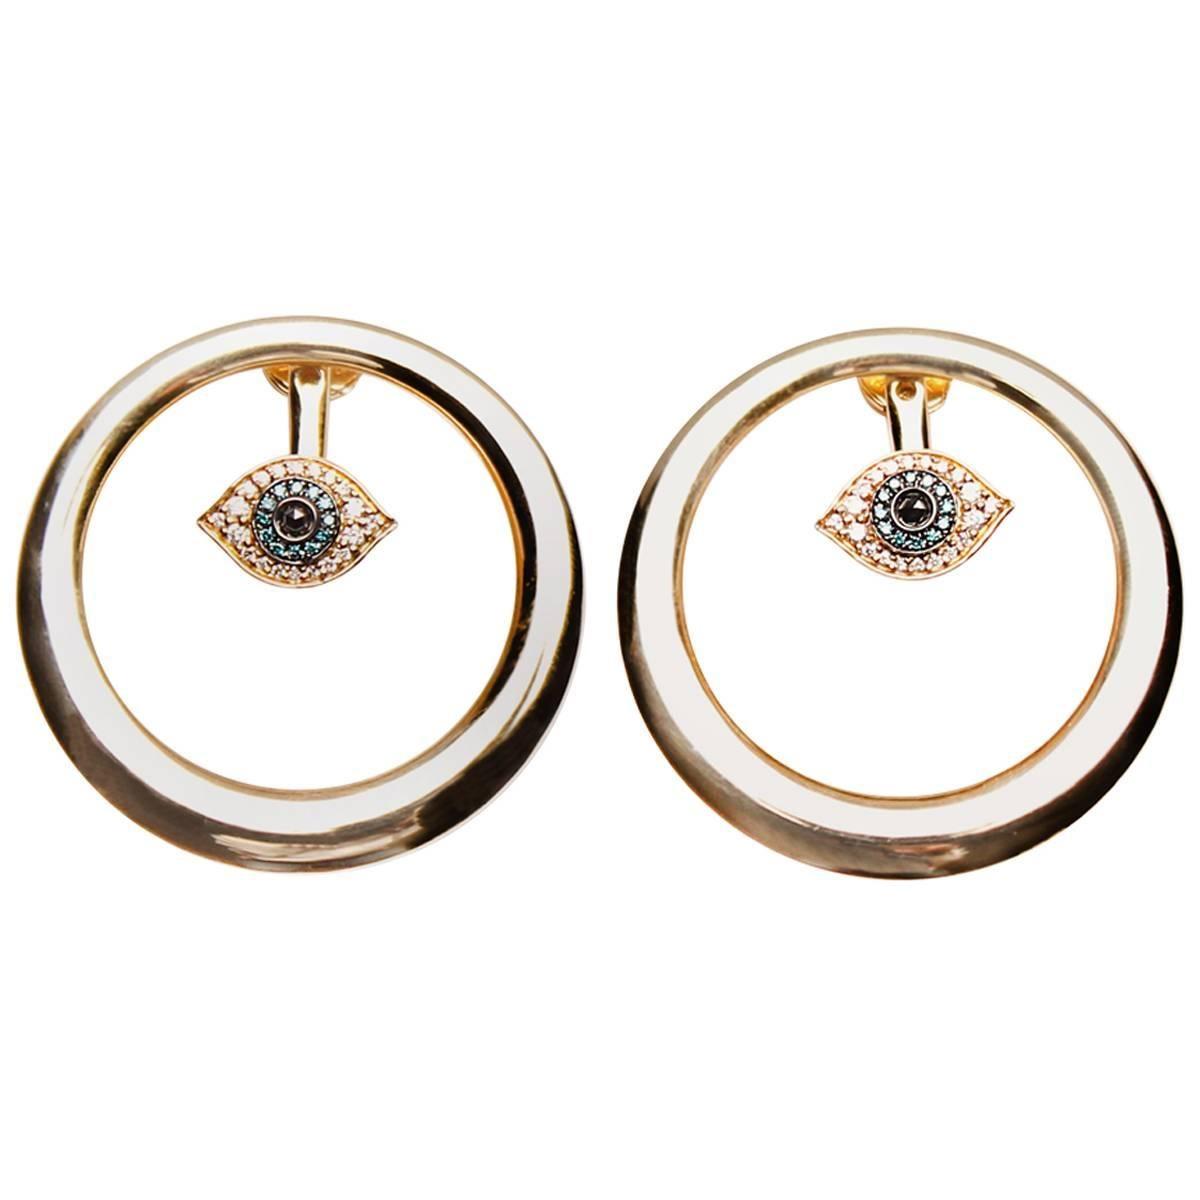 Clarissa Bronfman Yellow Gold Evil Eye Hoop Earrings with Diamonds